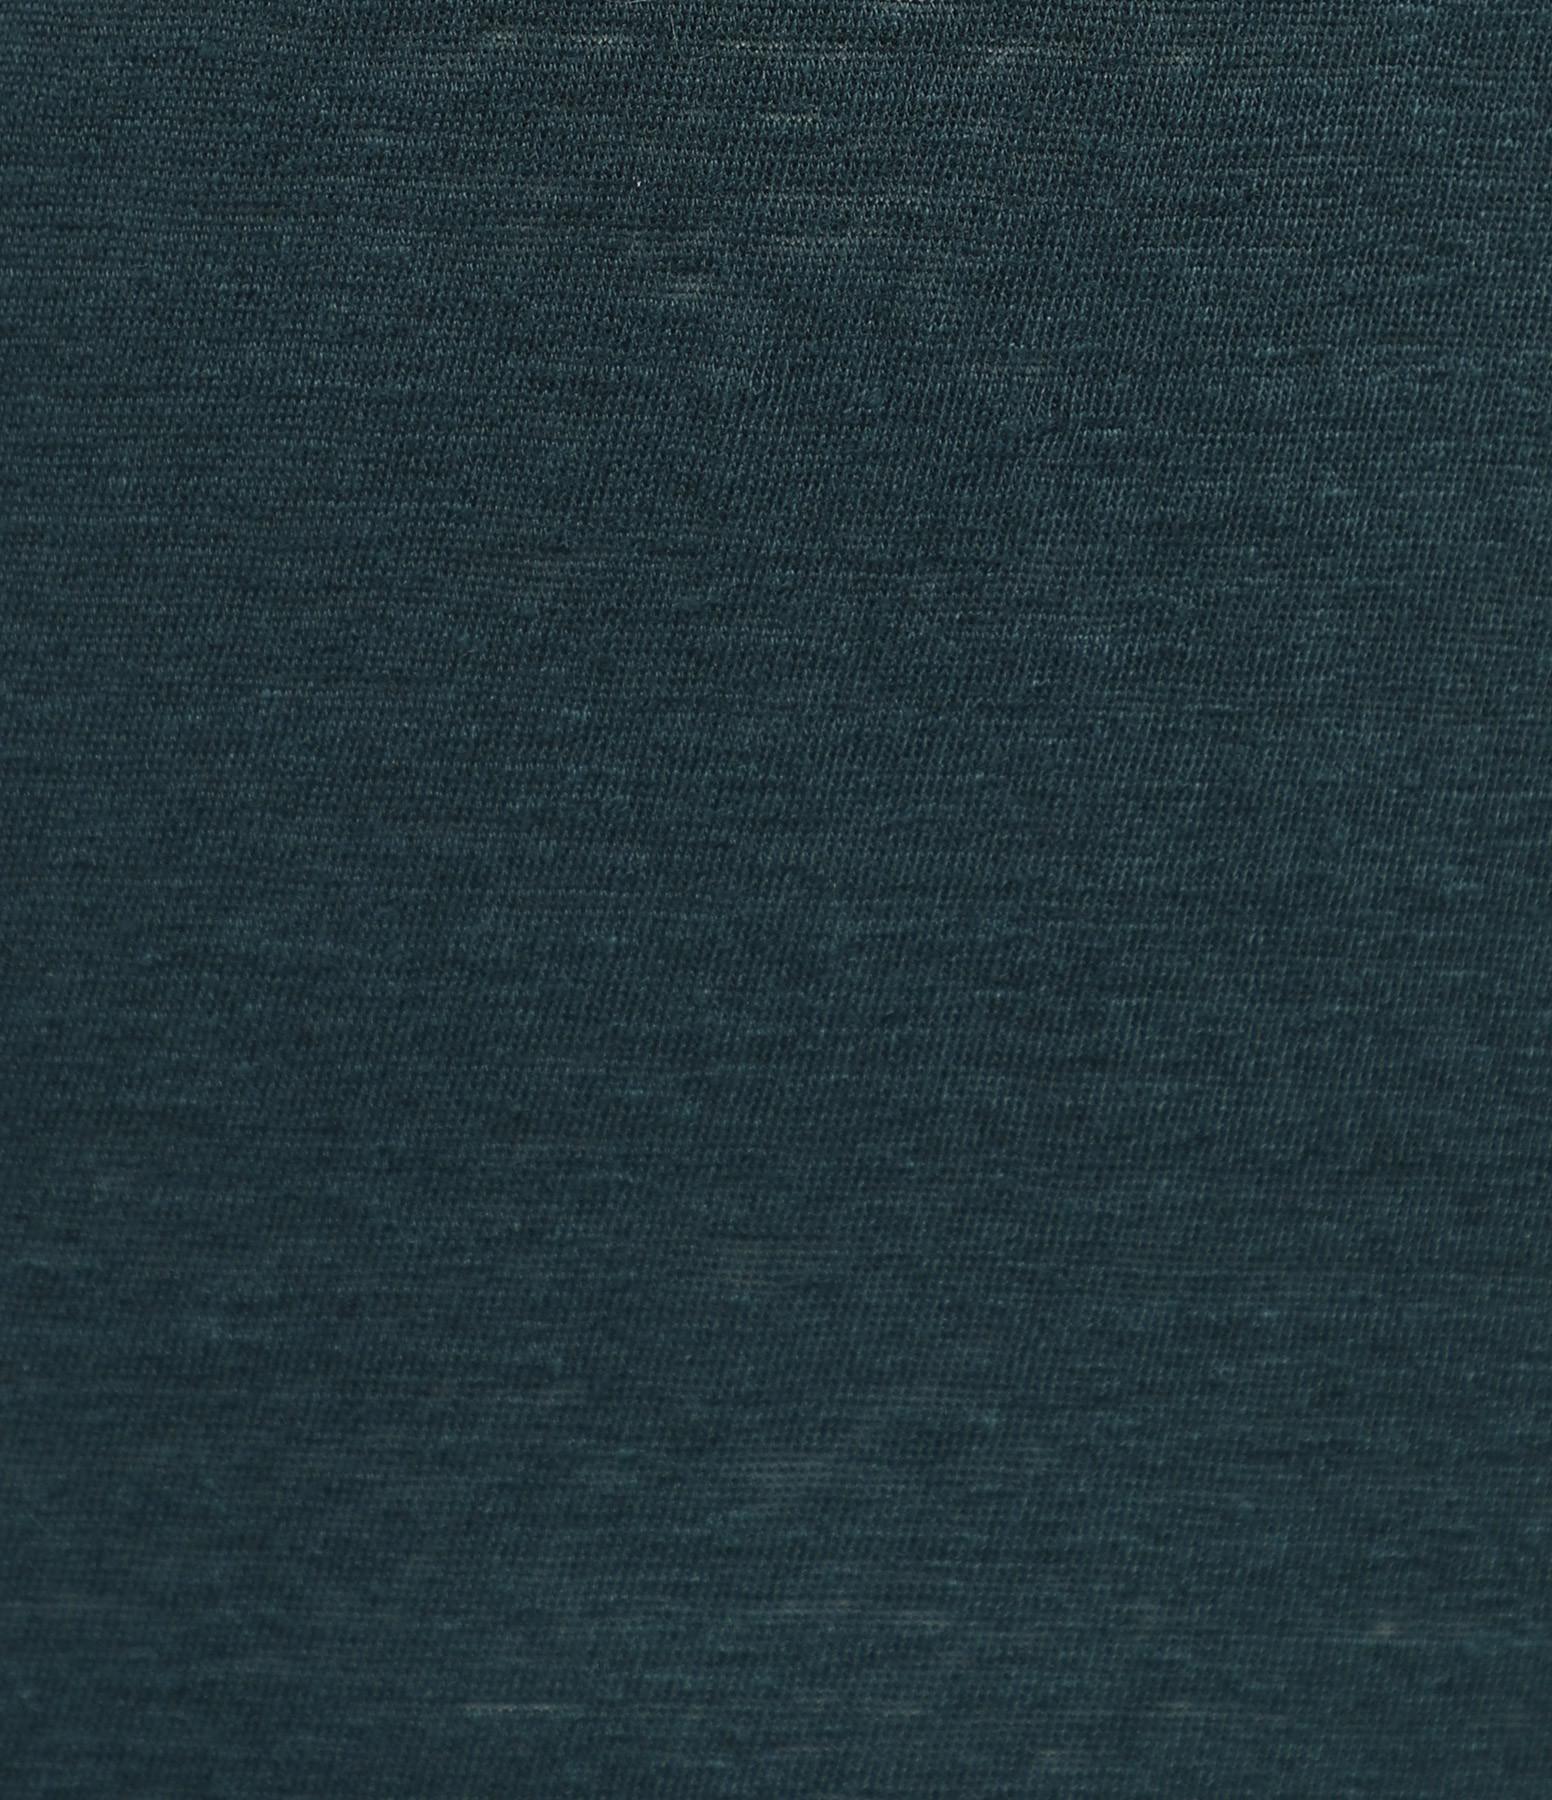 ISABEL MARANT ÉTOILE - Tee-shirt Zankou Lin Pétrole Clair